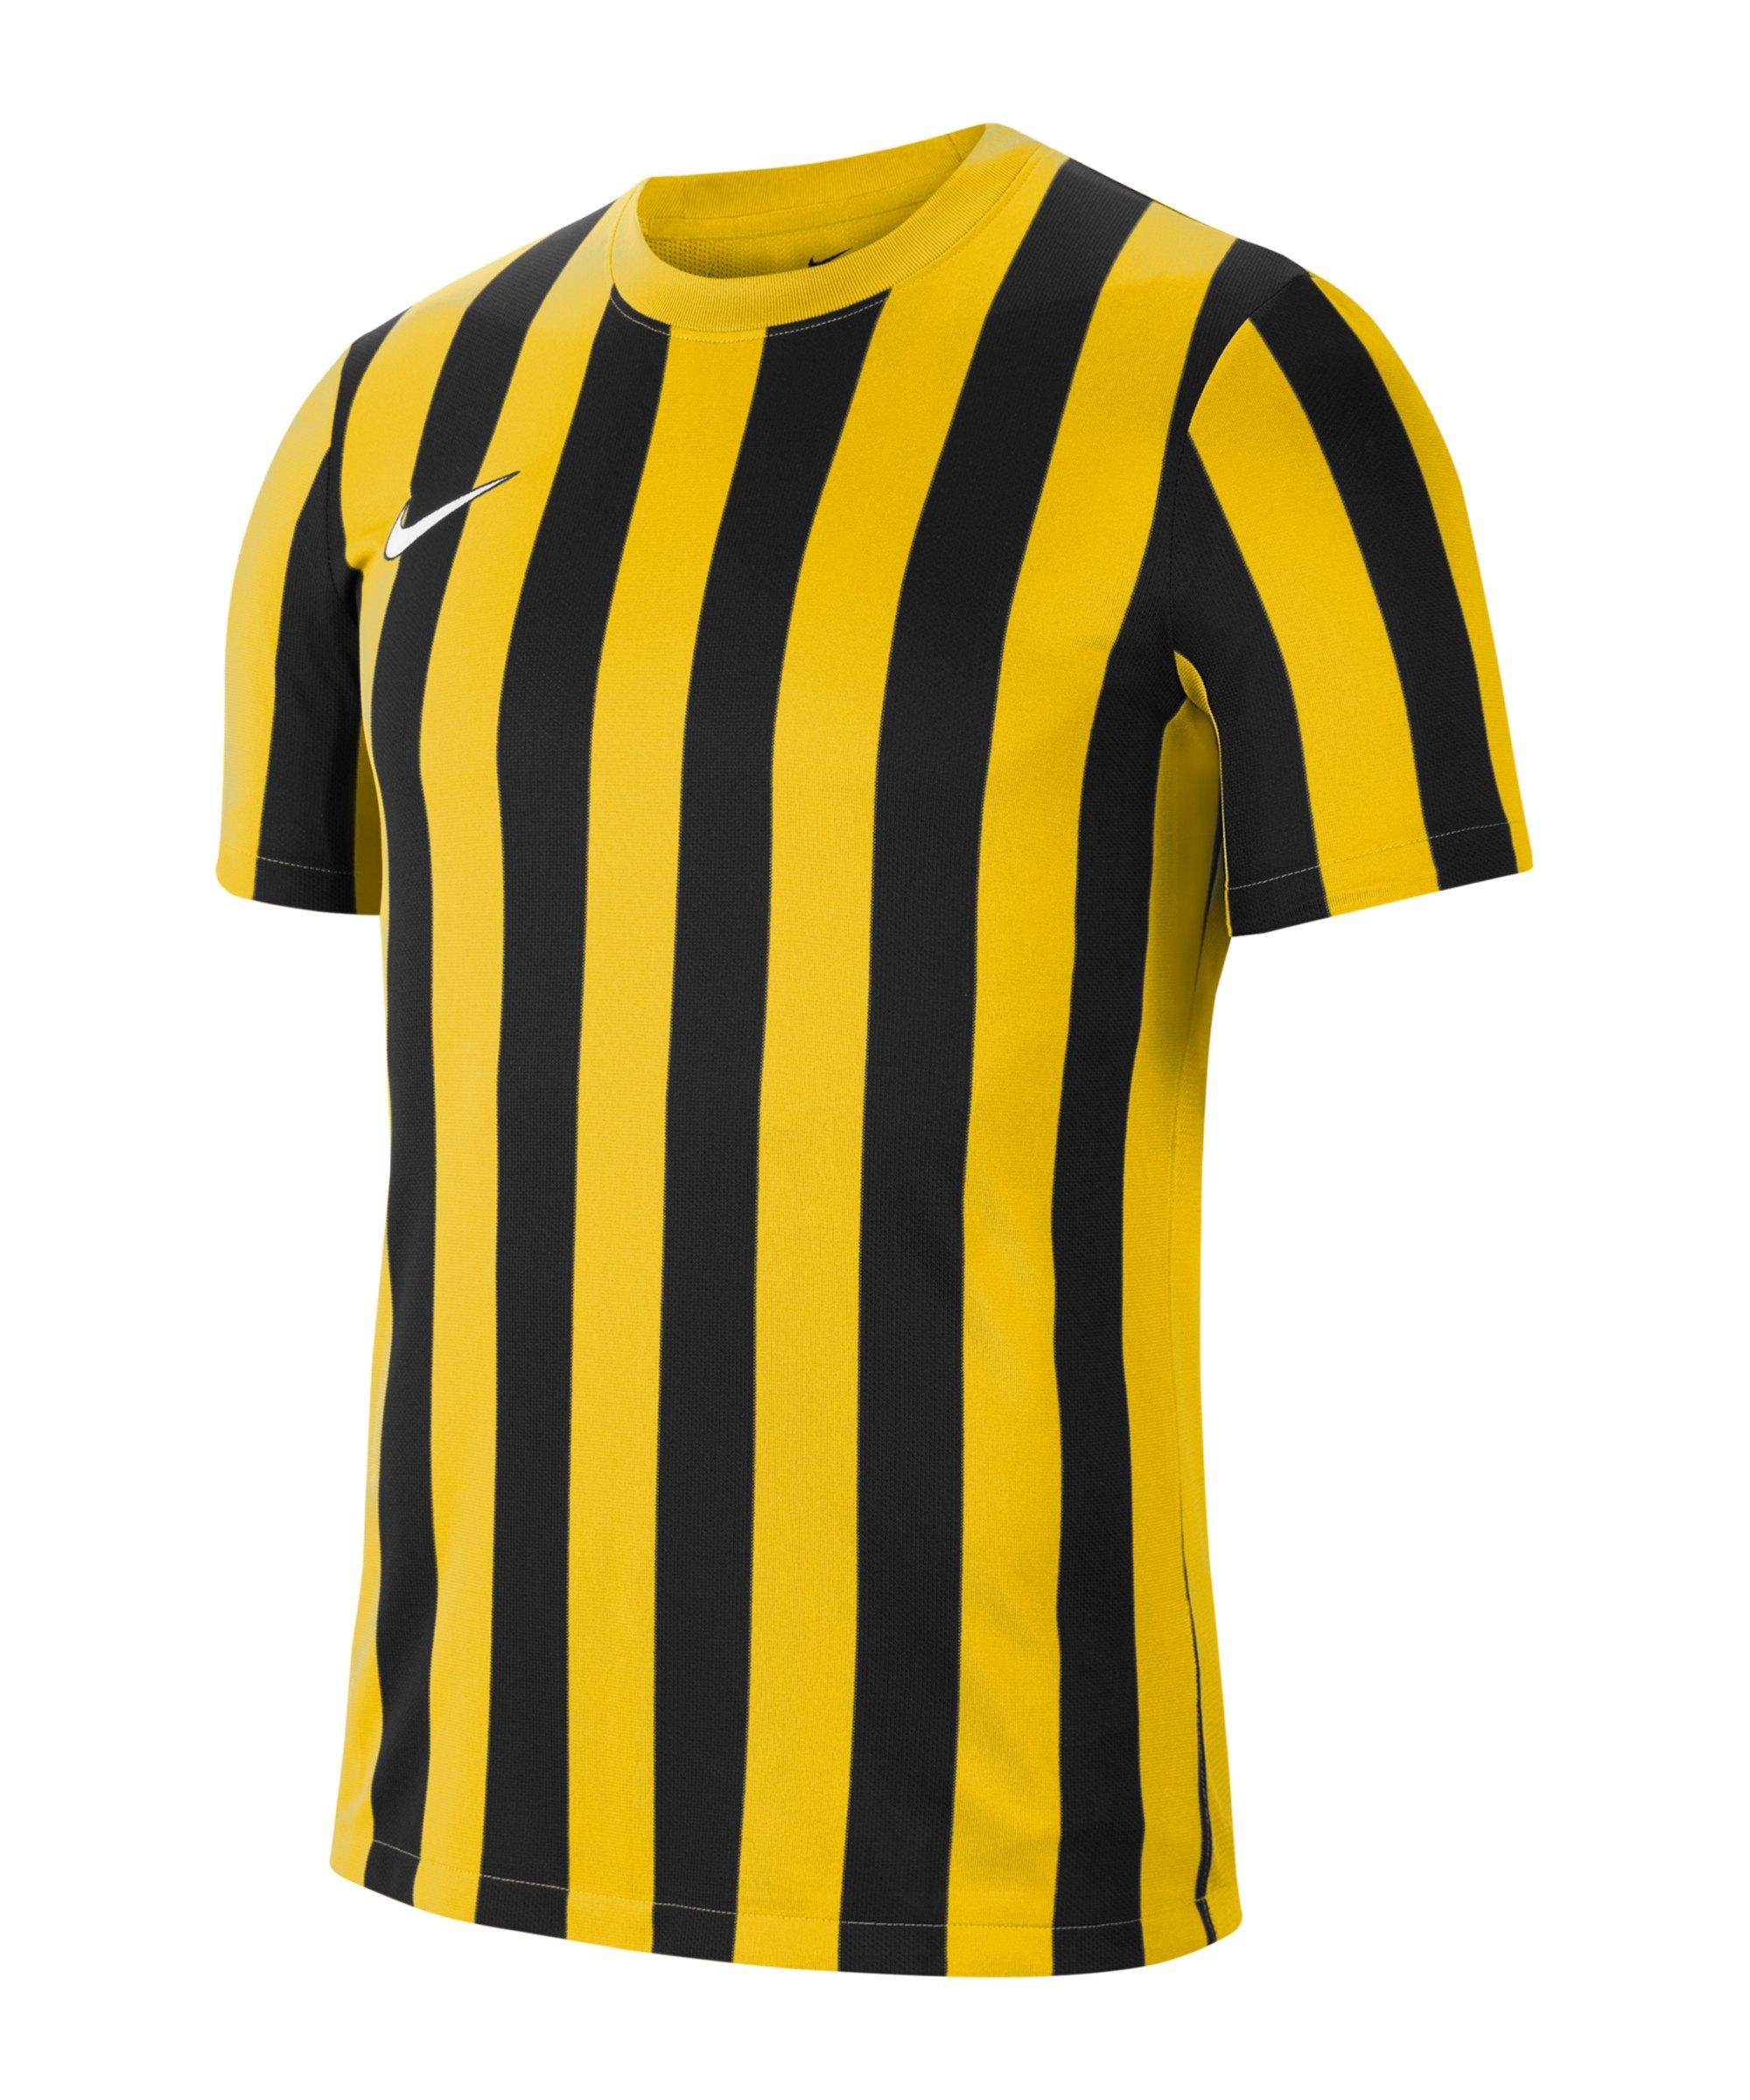 Nike Division IV Striped Trikot kurzarm Kids F719 - gelb